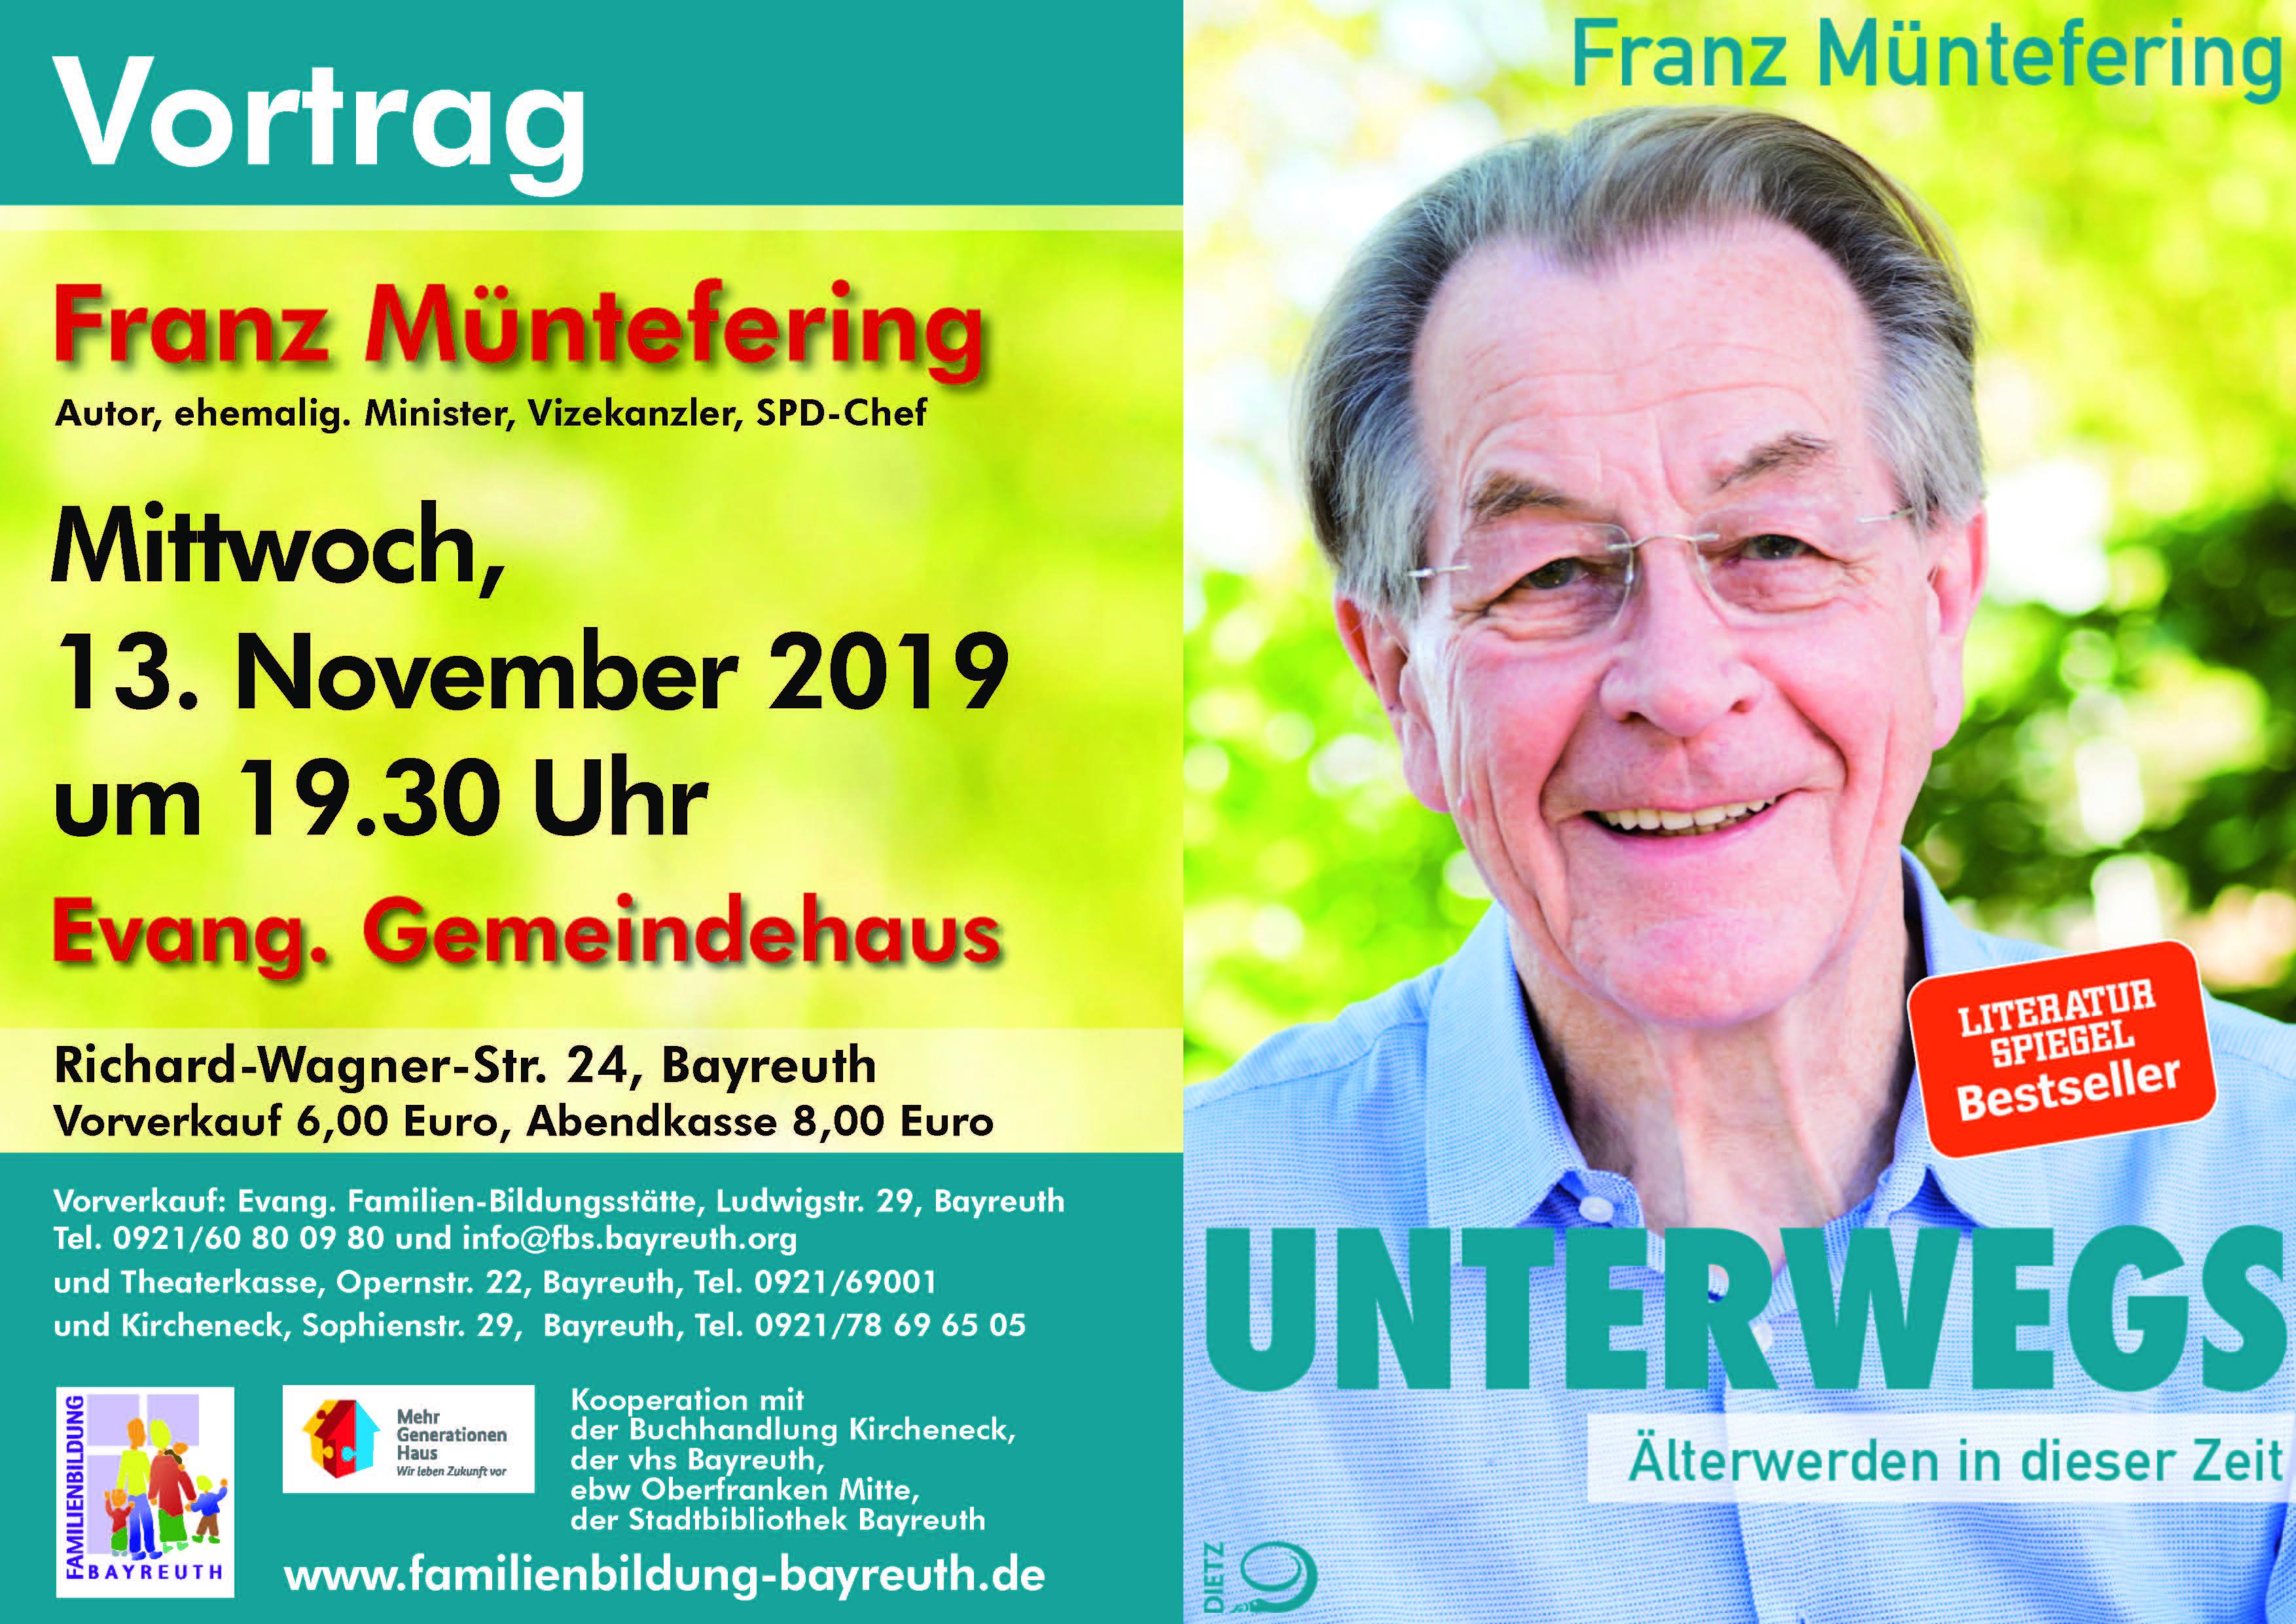 Vortrag Müntefering in Bayreuth